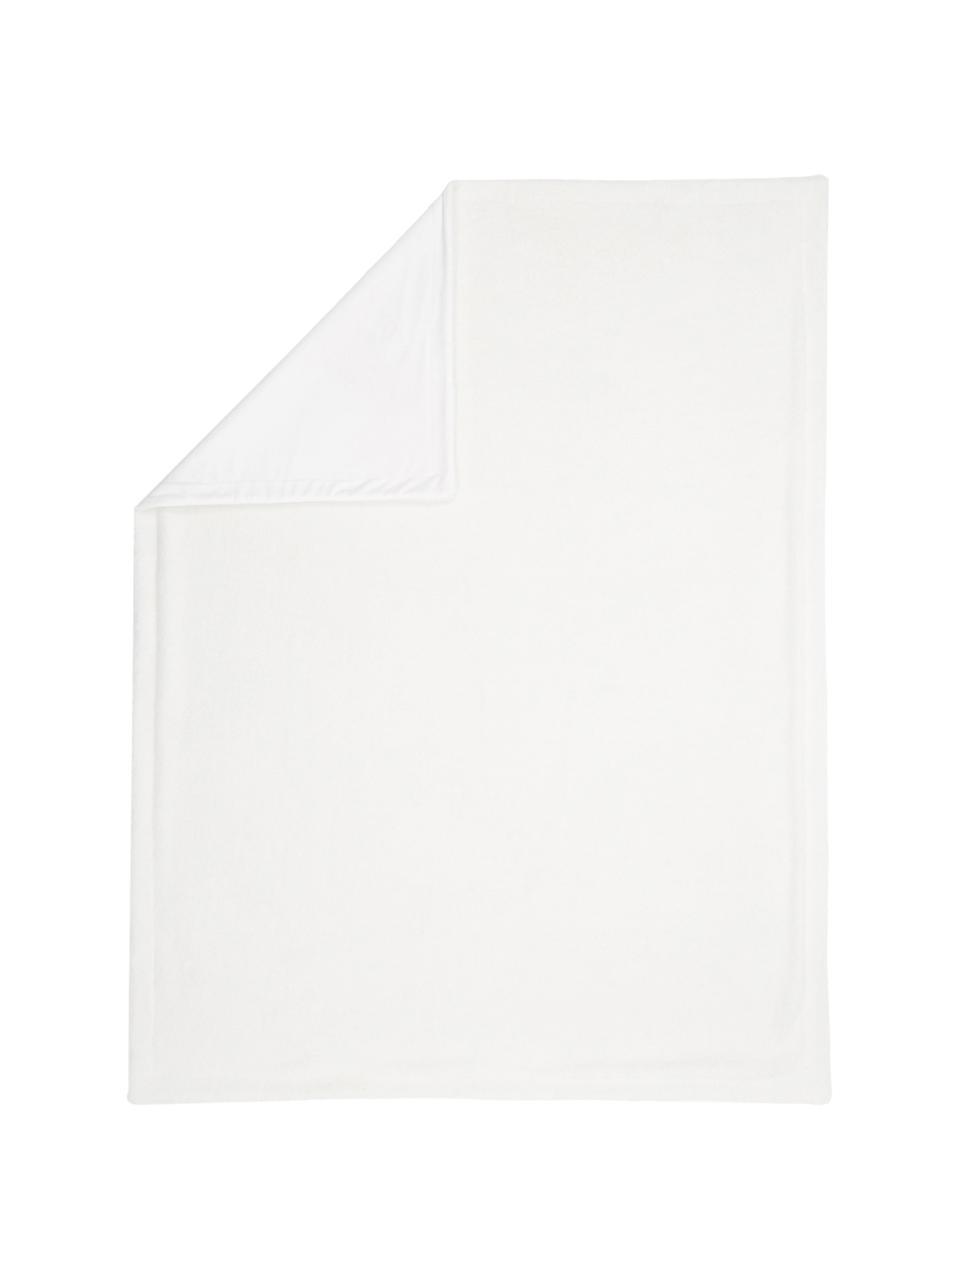 Teddy-Plaid Mille, Vorderseite: 100% Polyester (Teddyfell, Rückseite: 100% Polyester, Creme, 150 x 200 cm